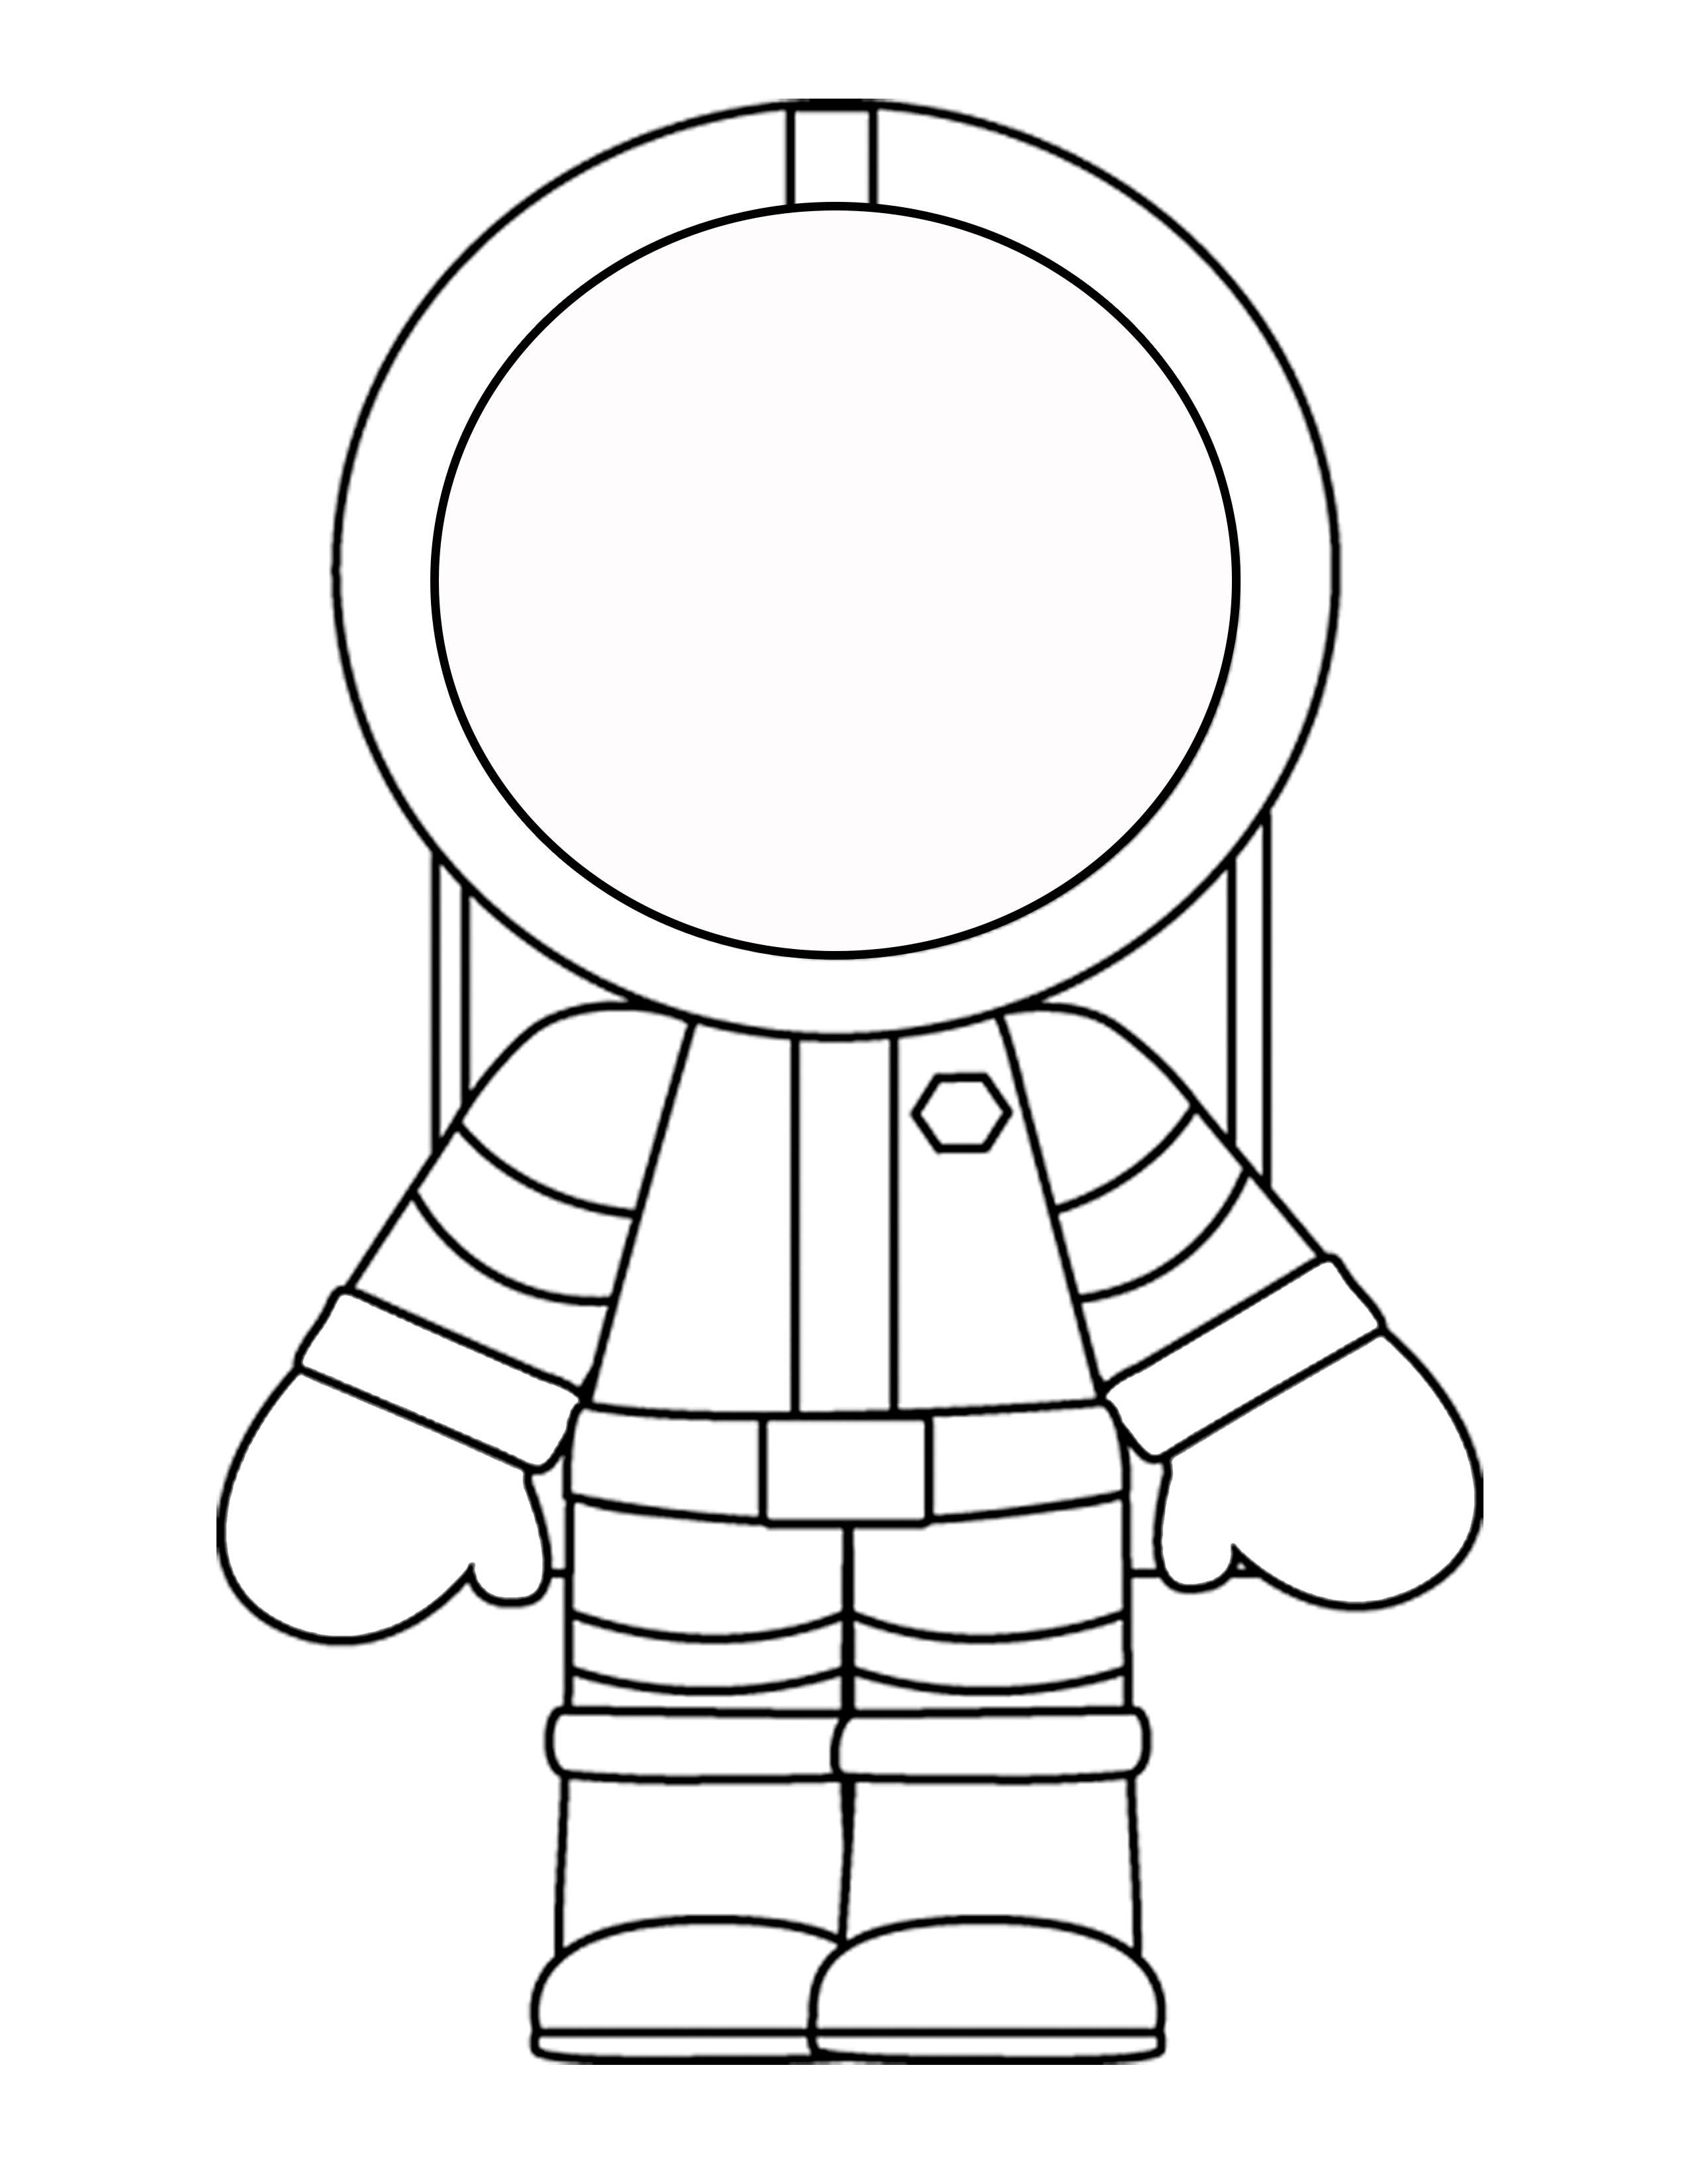 Astronaut clipart blank face Astronauts craft Printable for Astronaut